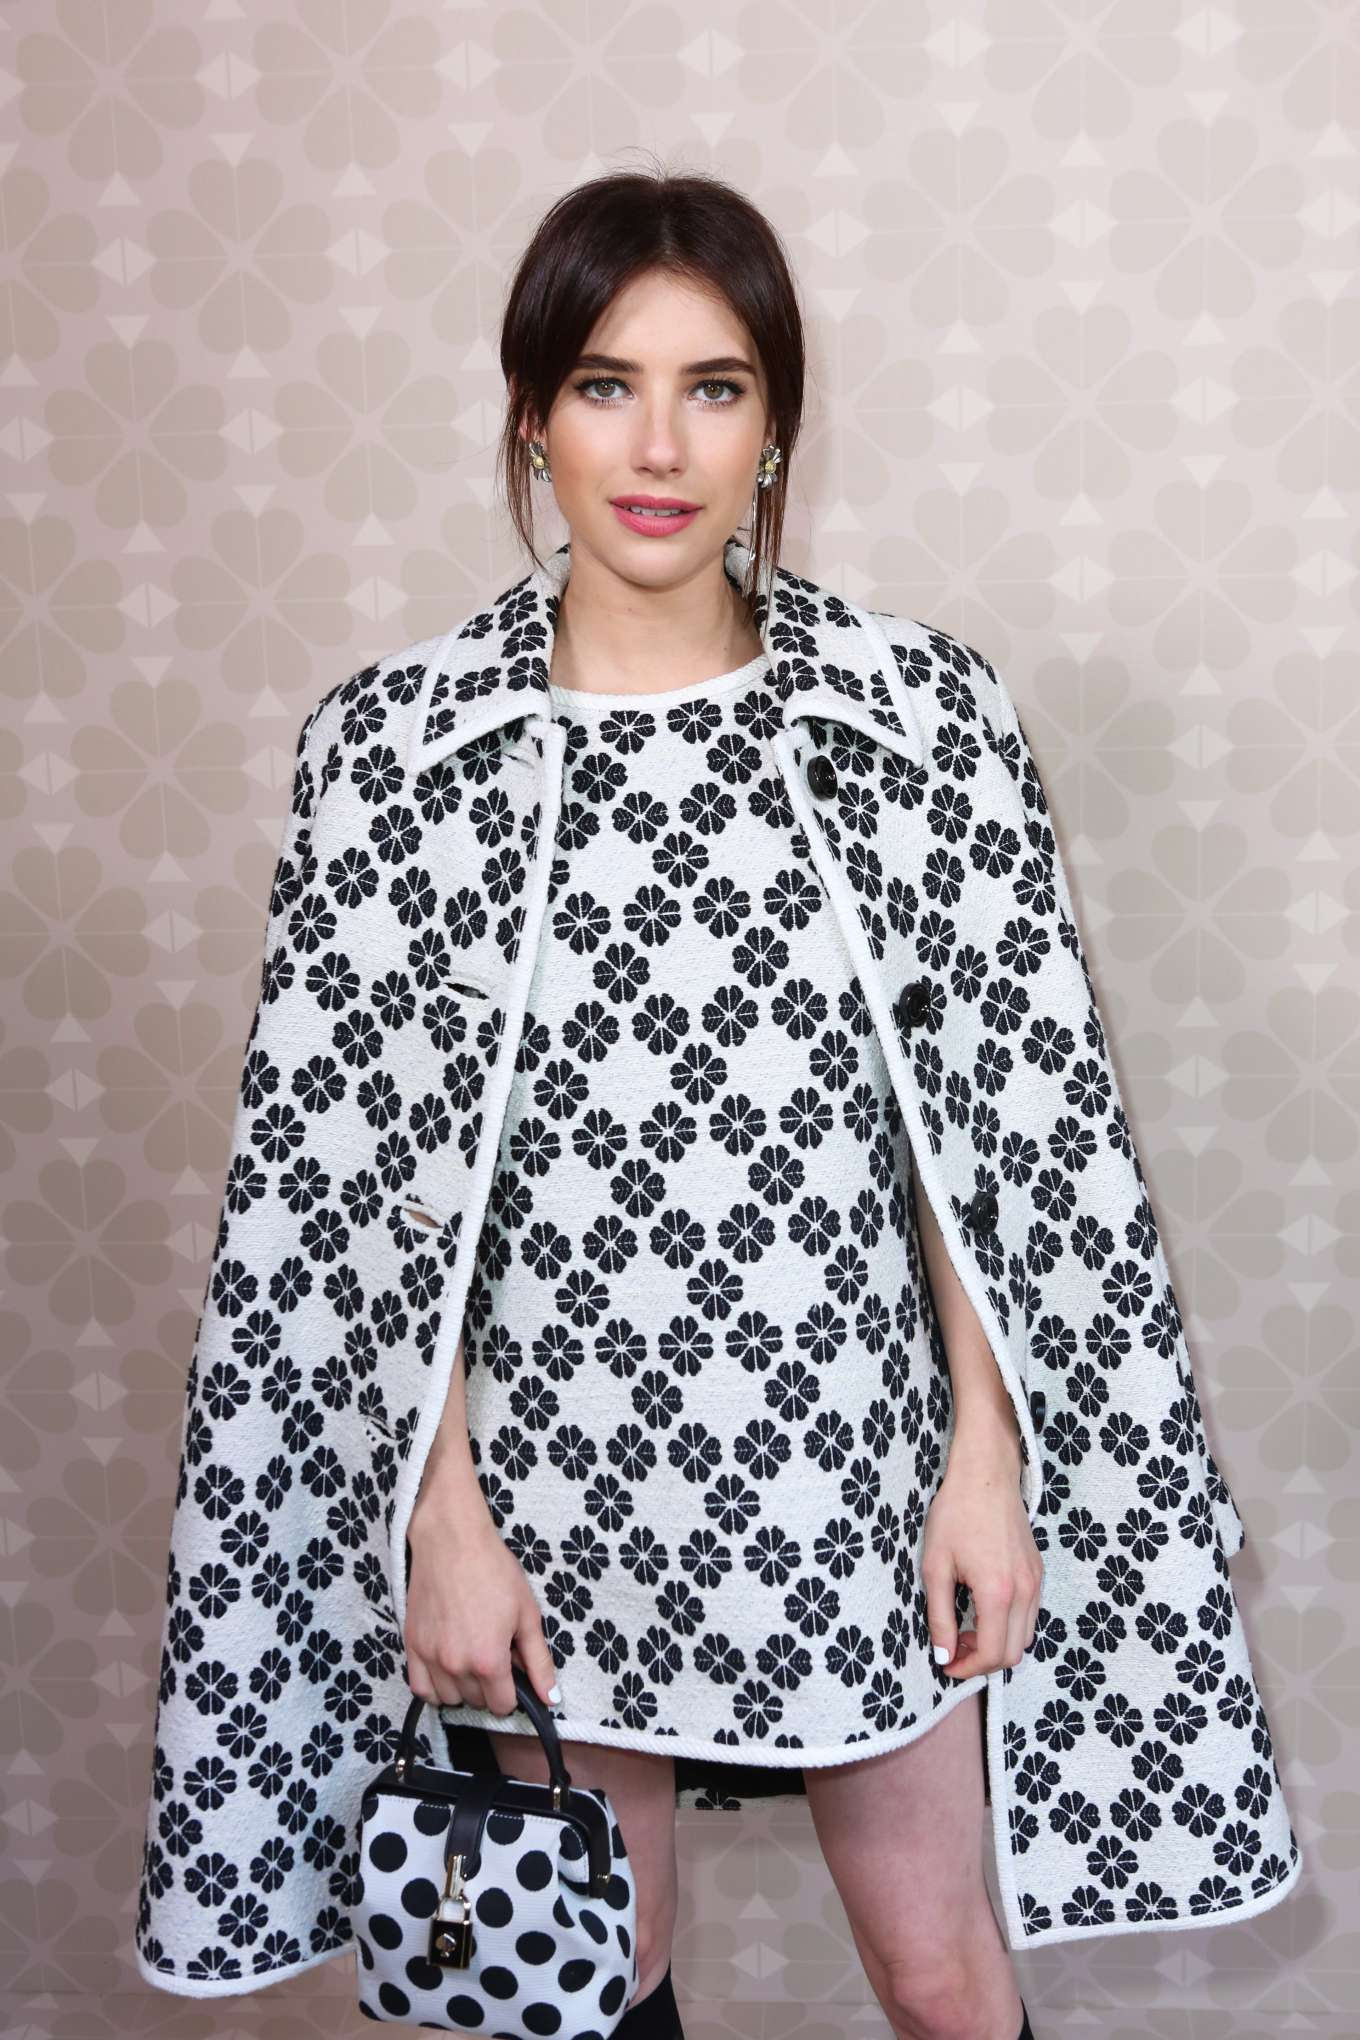 Emma Roberts - Kate Spade Fashion Show during New York Fashion Week in New York